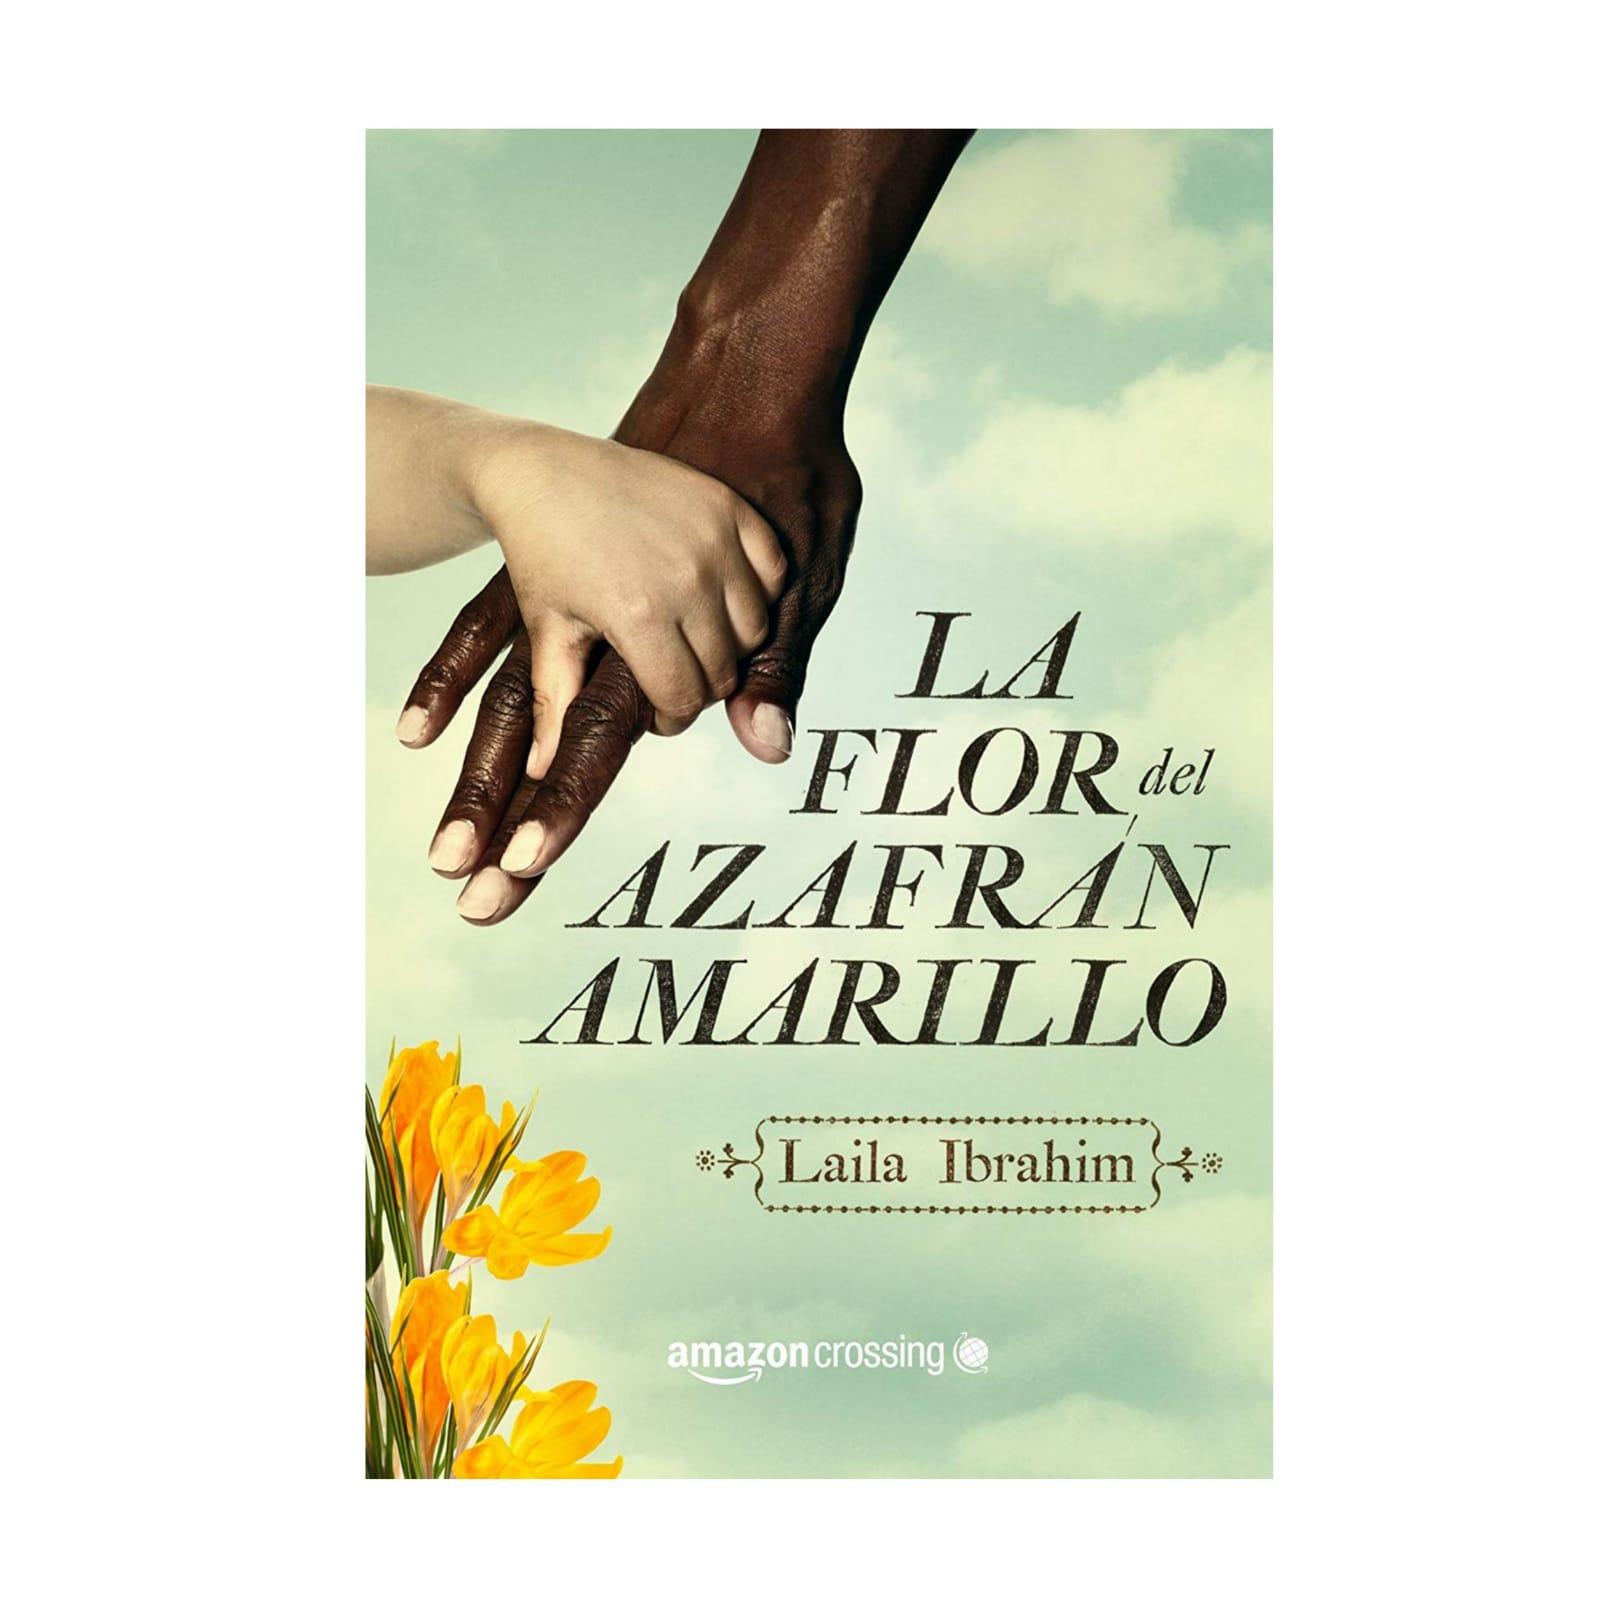 La flor del azafrán Amarillo. Laila Ibrahim